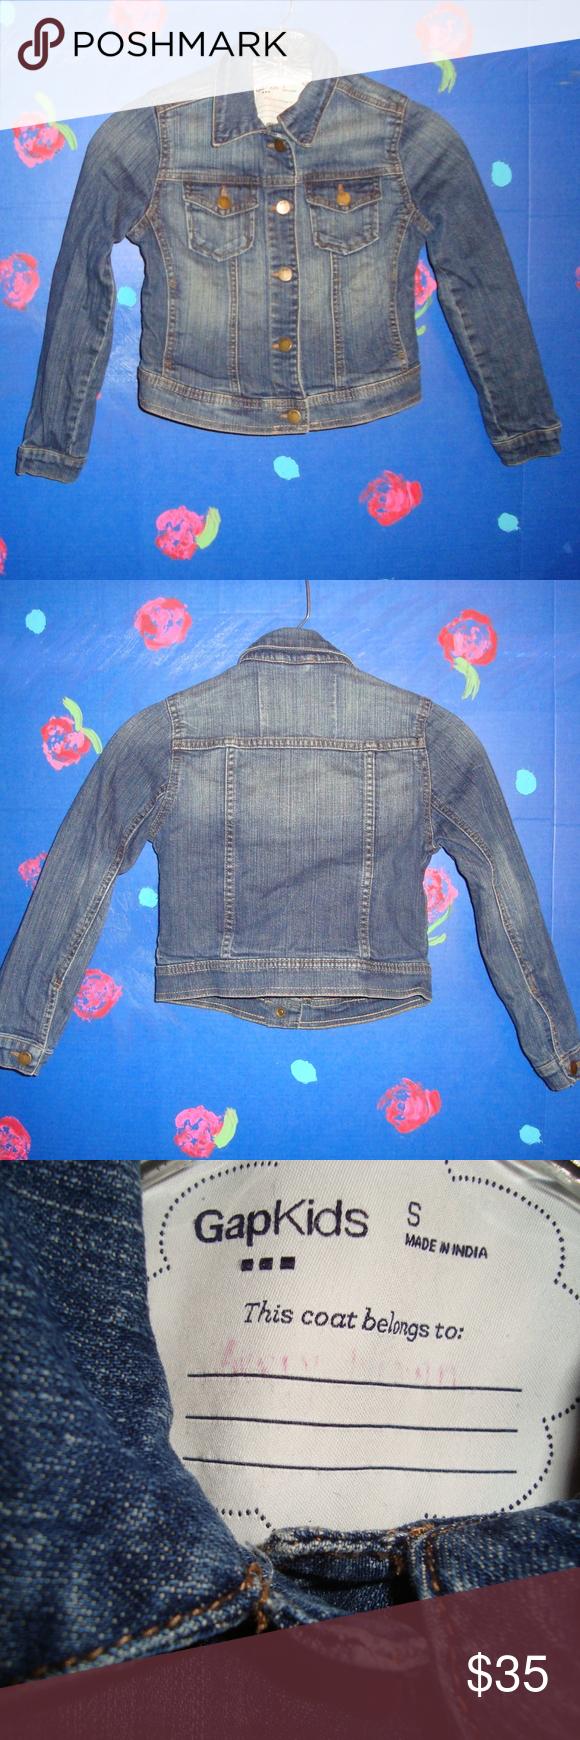 Gap Kids Denim Jacket Size Small Kids Denim Jacket Kids Denim Gap Kids [ 1740 x 580 Pixel ]